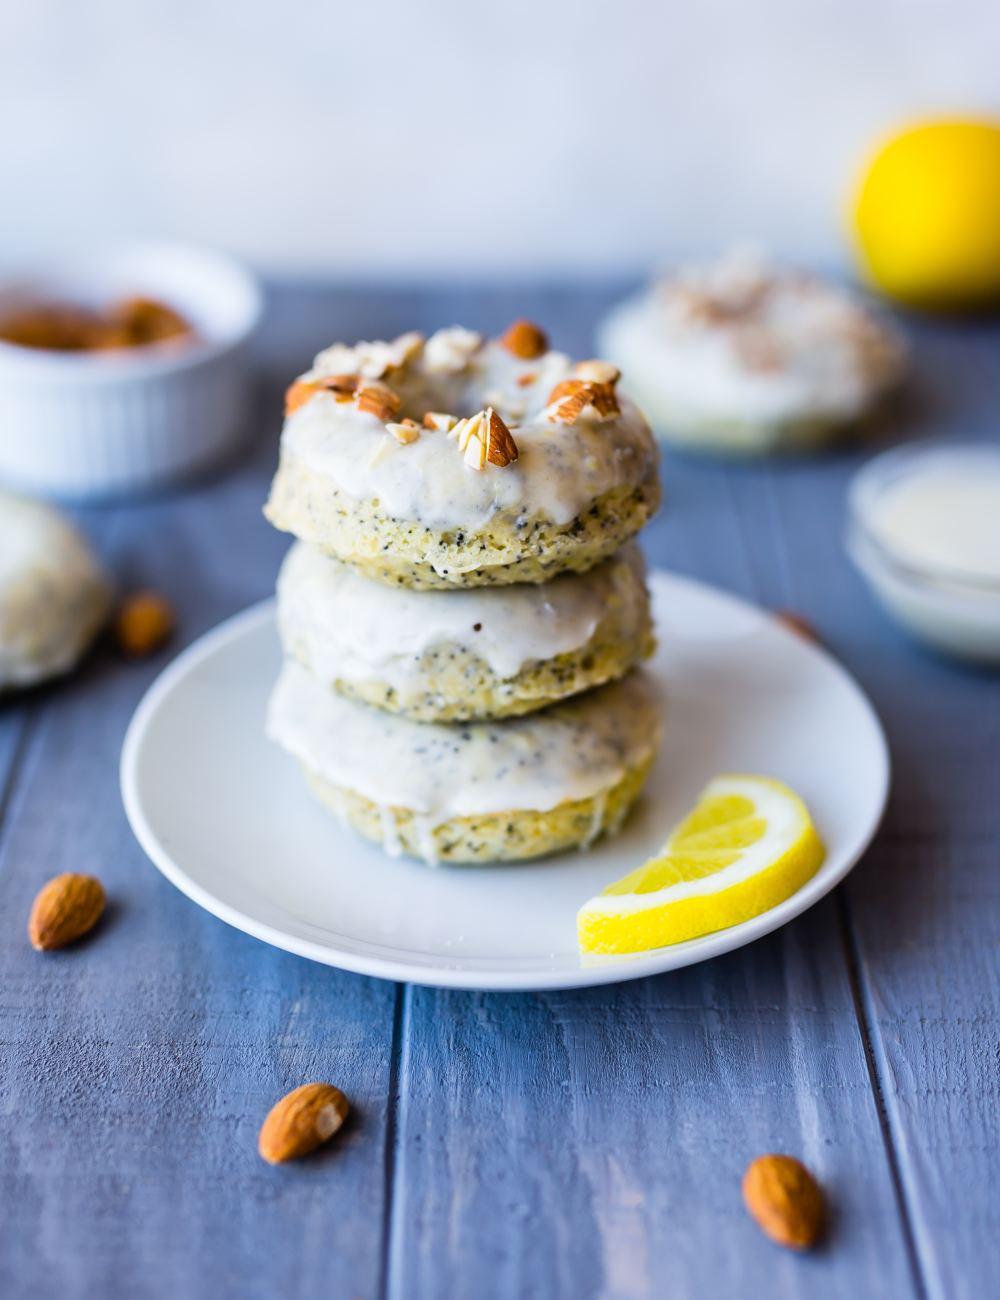 Lemon and donuts.